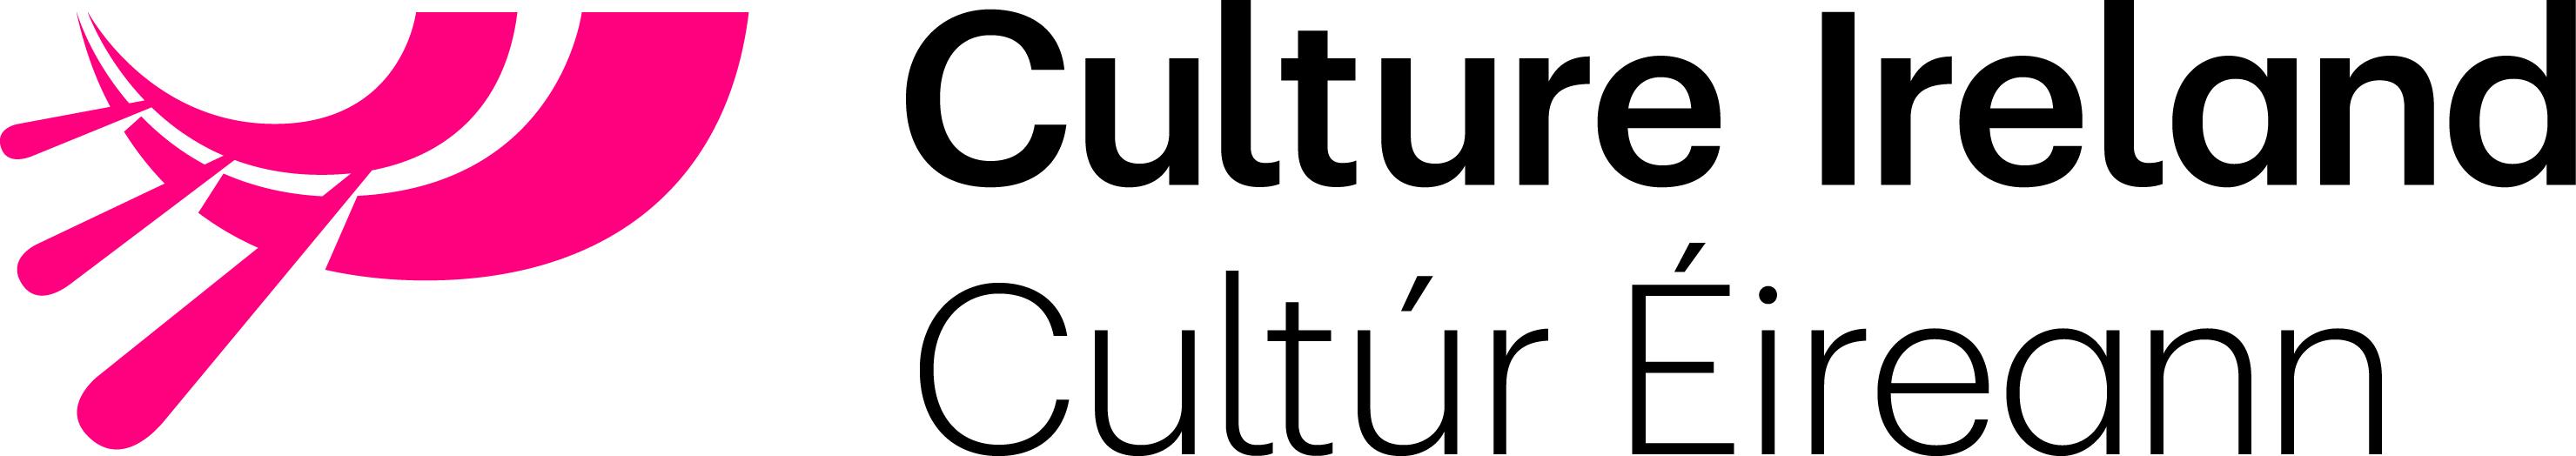 https://www.cultureireland.ie/downloads-public/Colour_Logo_2.jpg